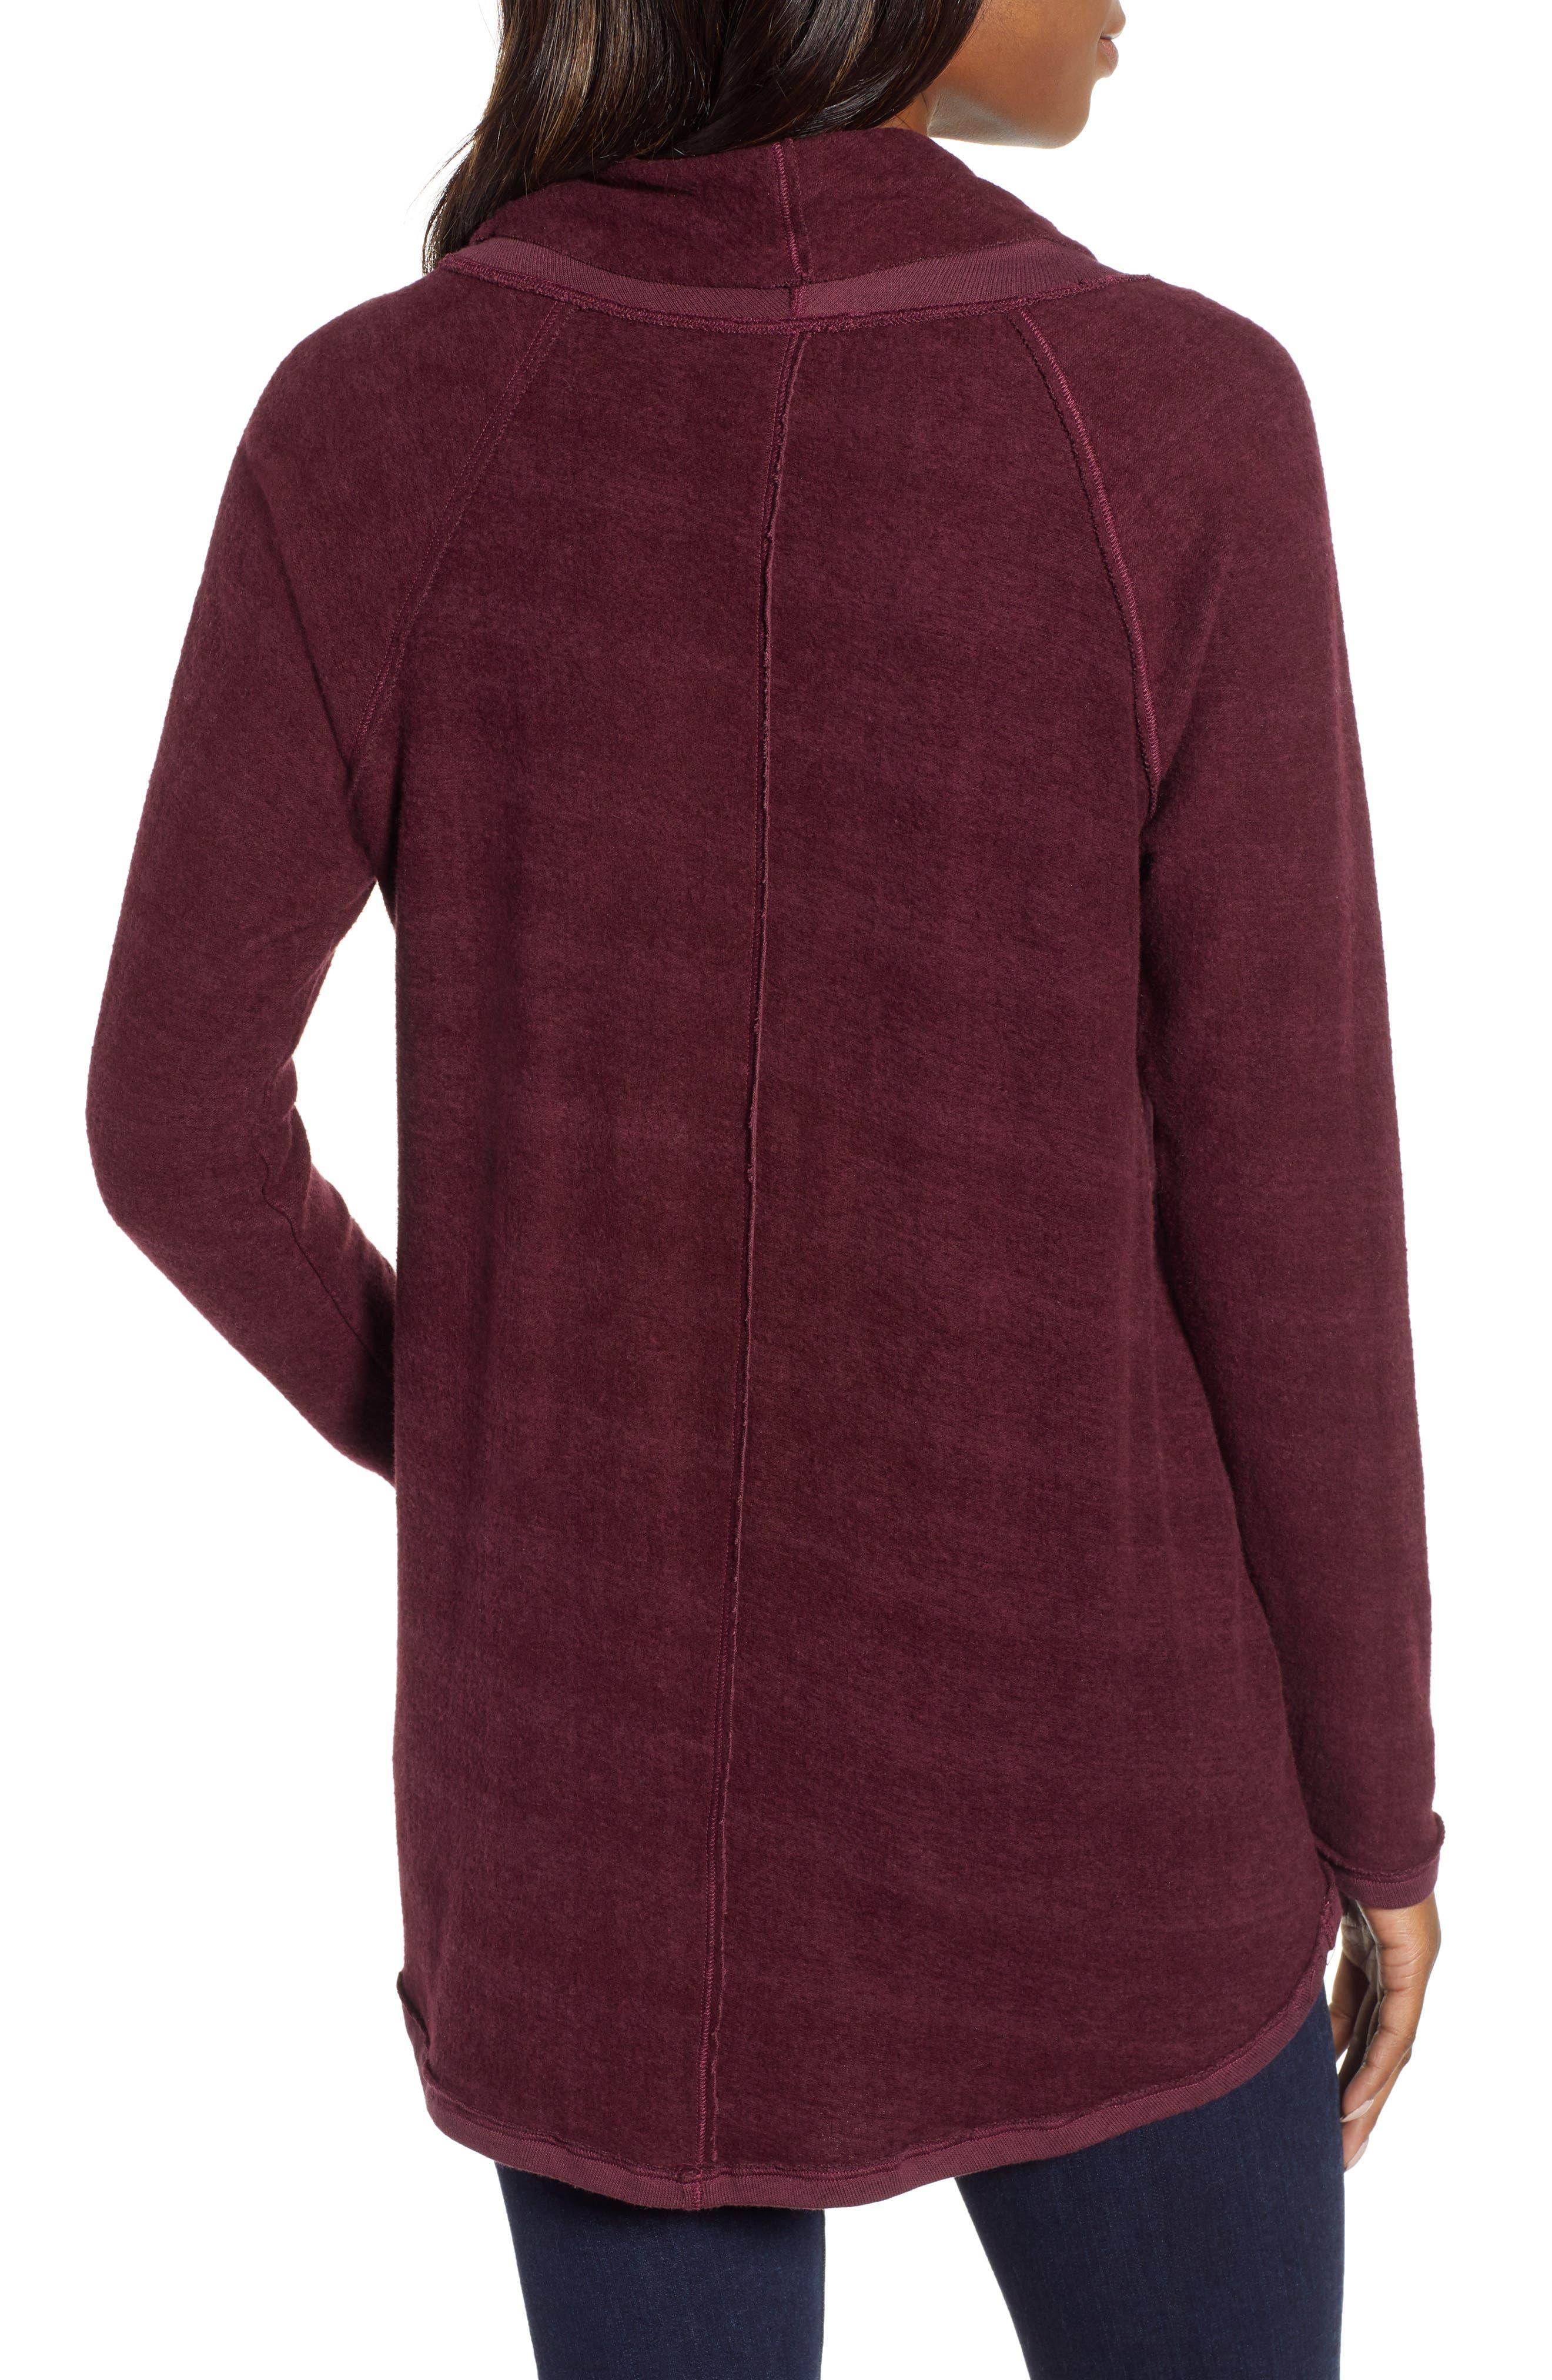 Knit Cowl Neck Tunic,                             Alternate thumbnail 2, color,                             930